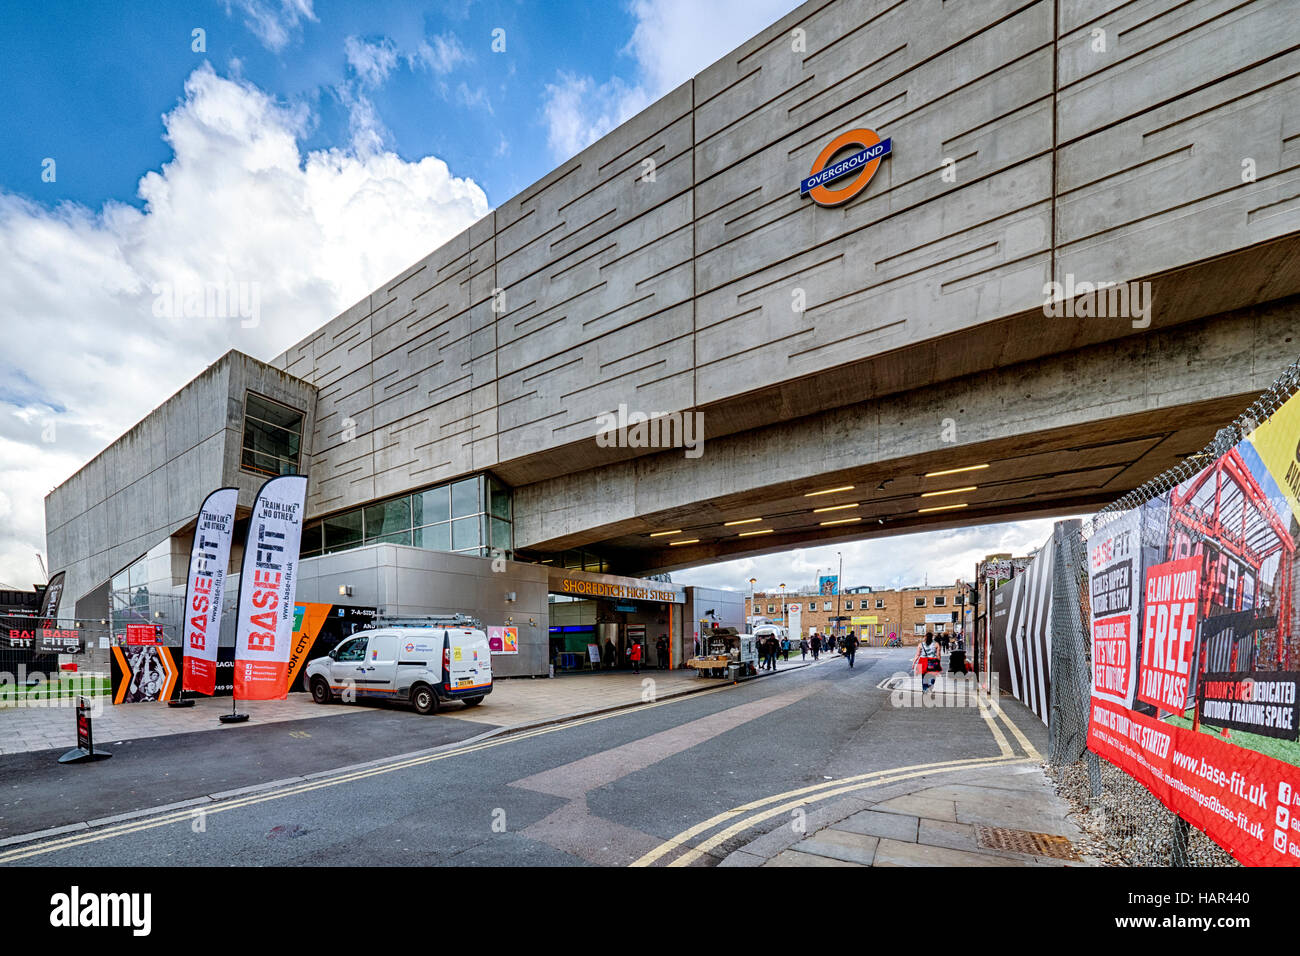 Shoreditch High Street Overground station - Stock Image